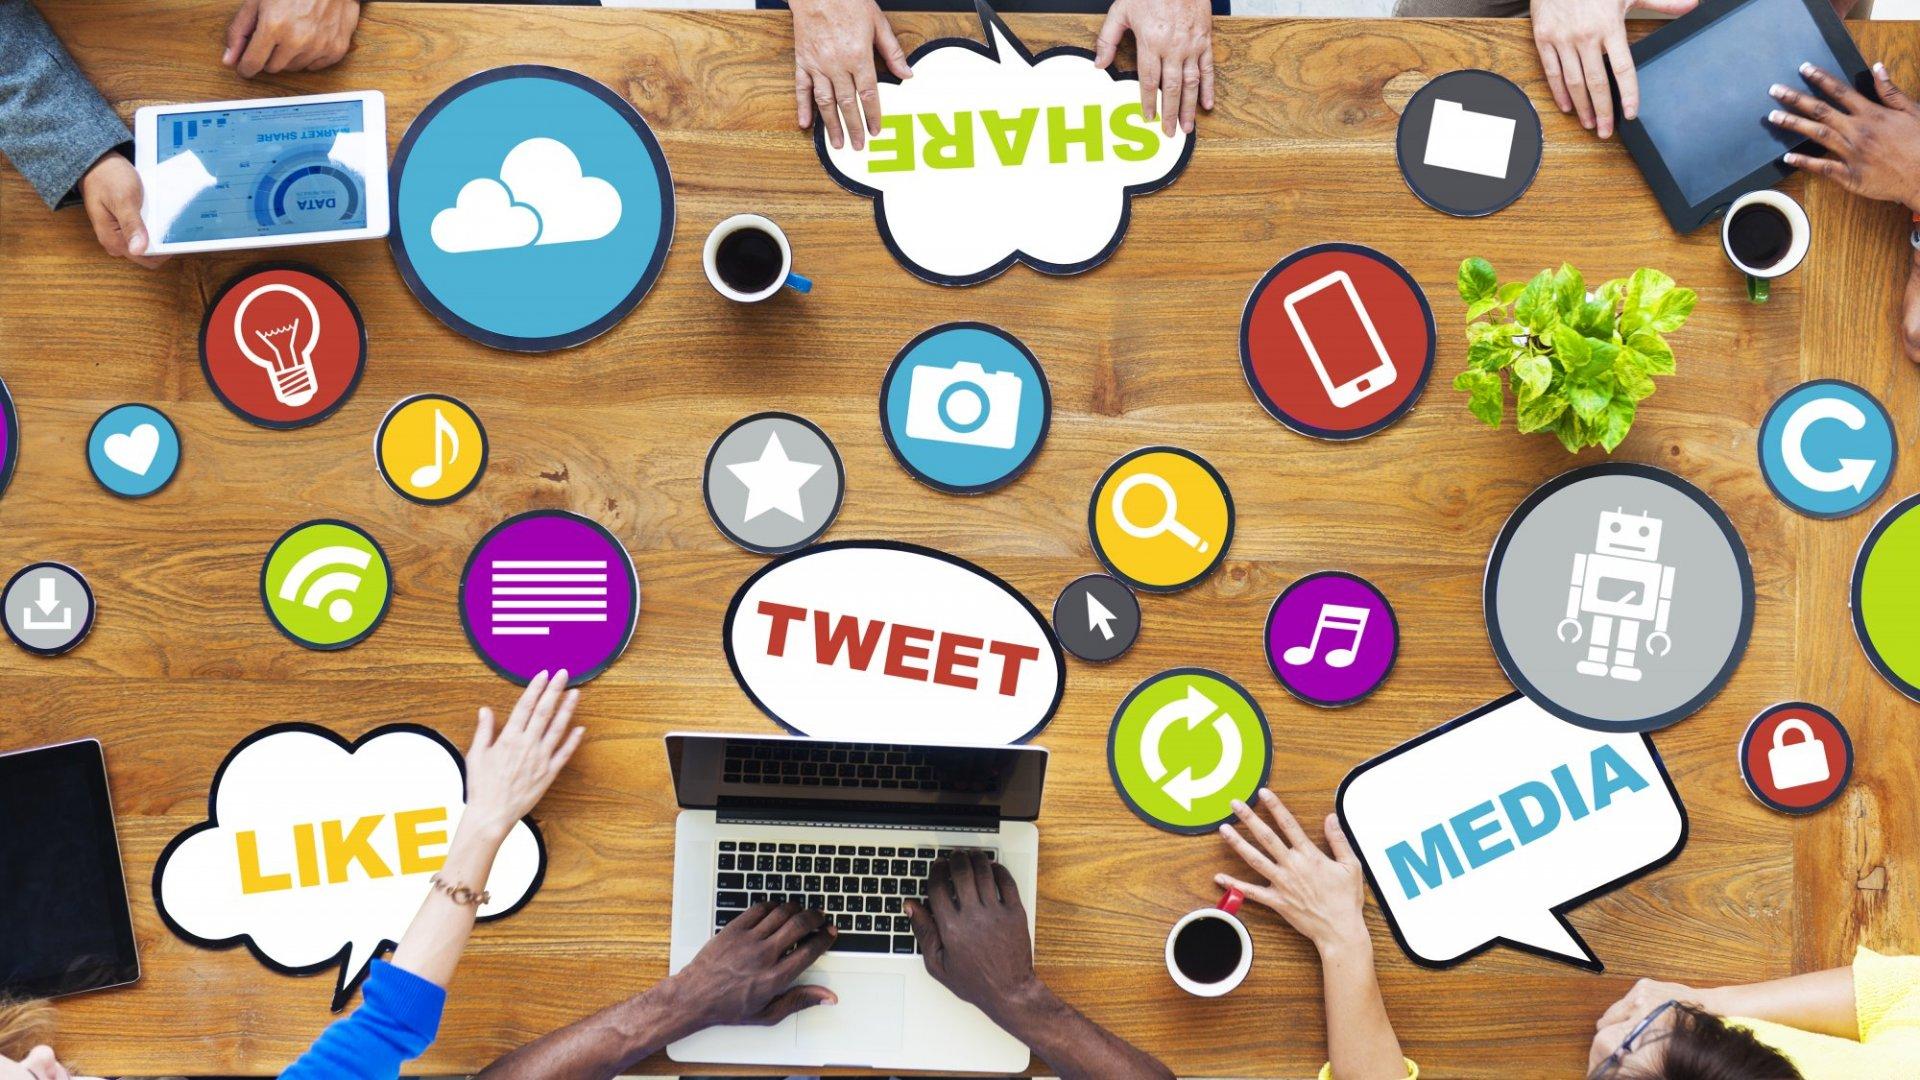 3 Brain Hacks to Fix the Bad Habits Social Media Has Given Us